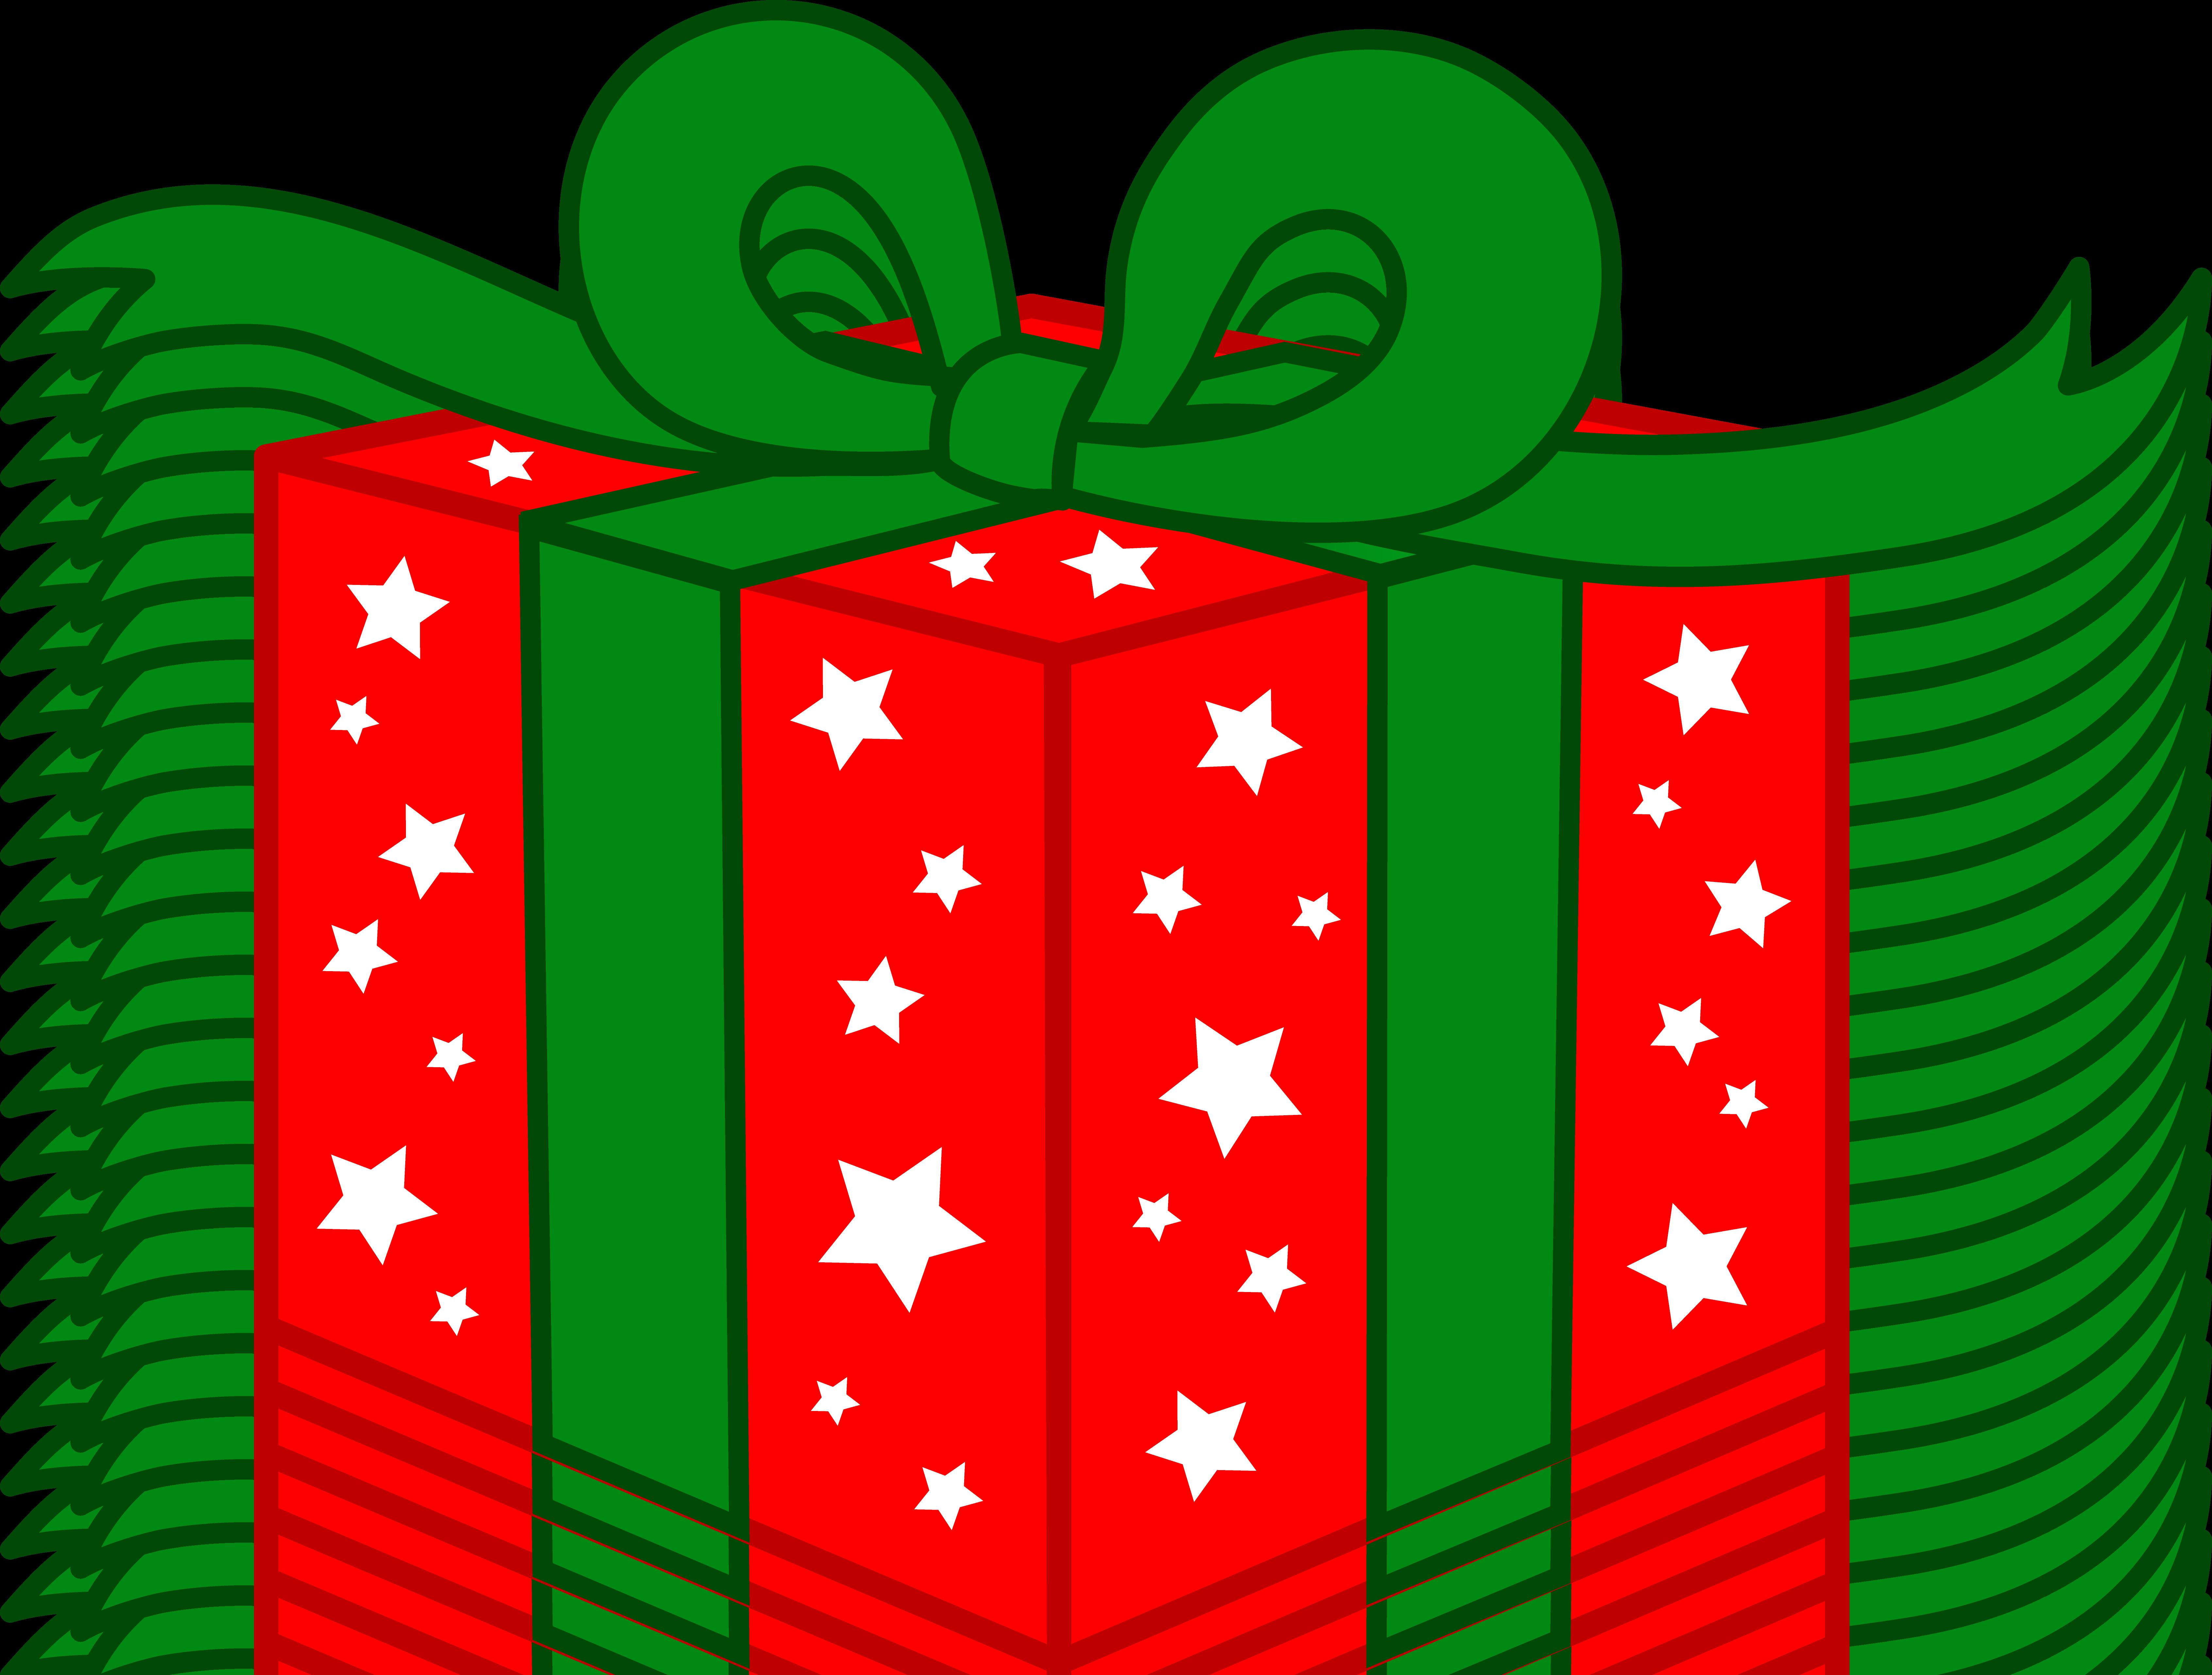 Christmas present clip art xmasblor for Decoration on a present